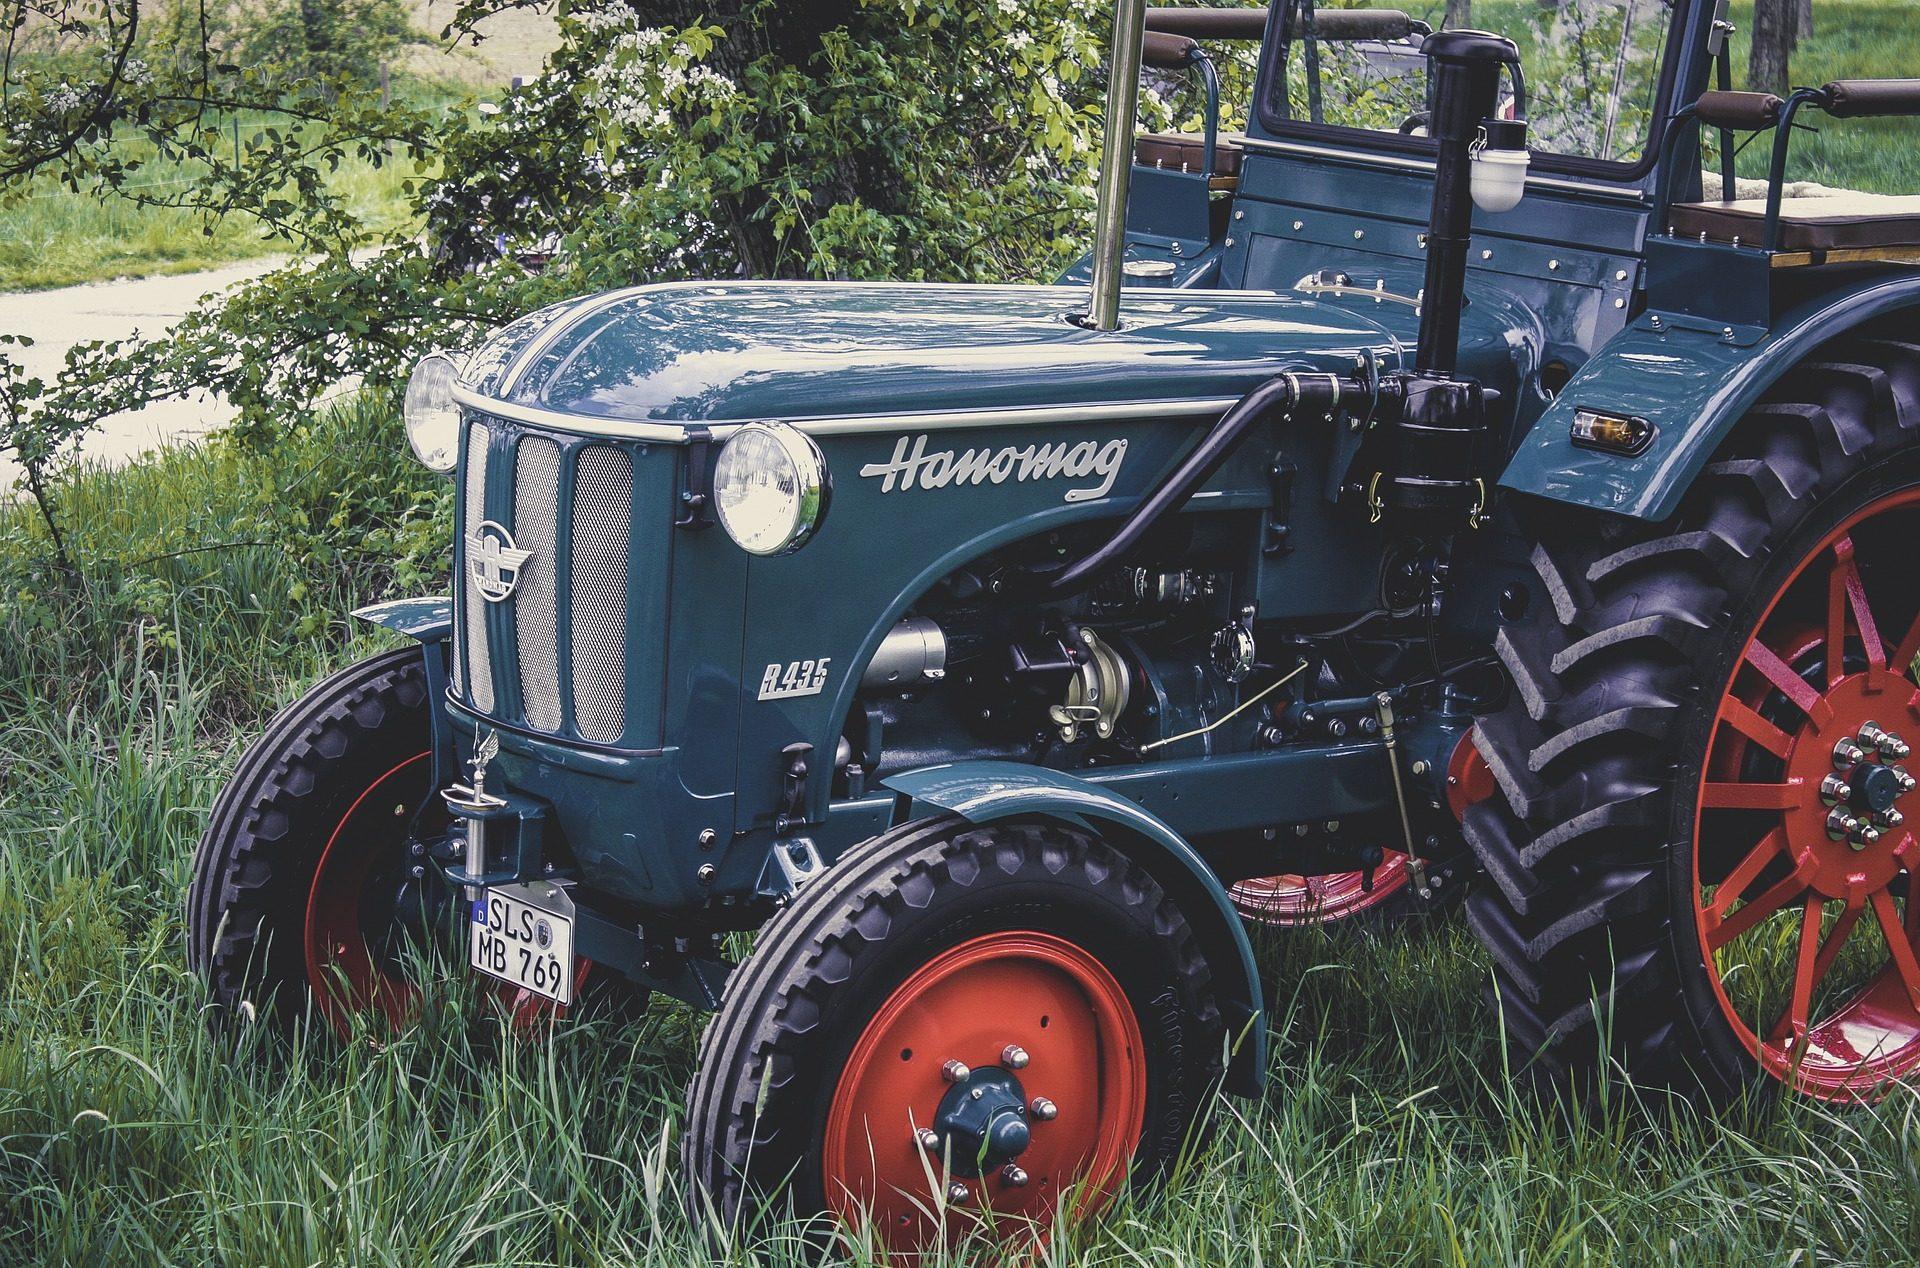 tractor, granja, labranza, agricultura, campo - Fondos de Pantalla HD - professor-falken.com